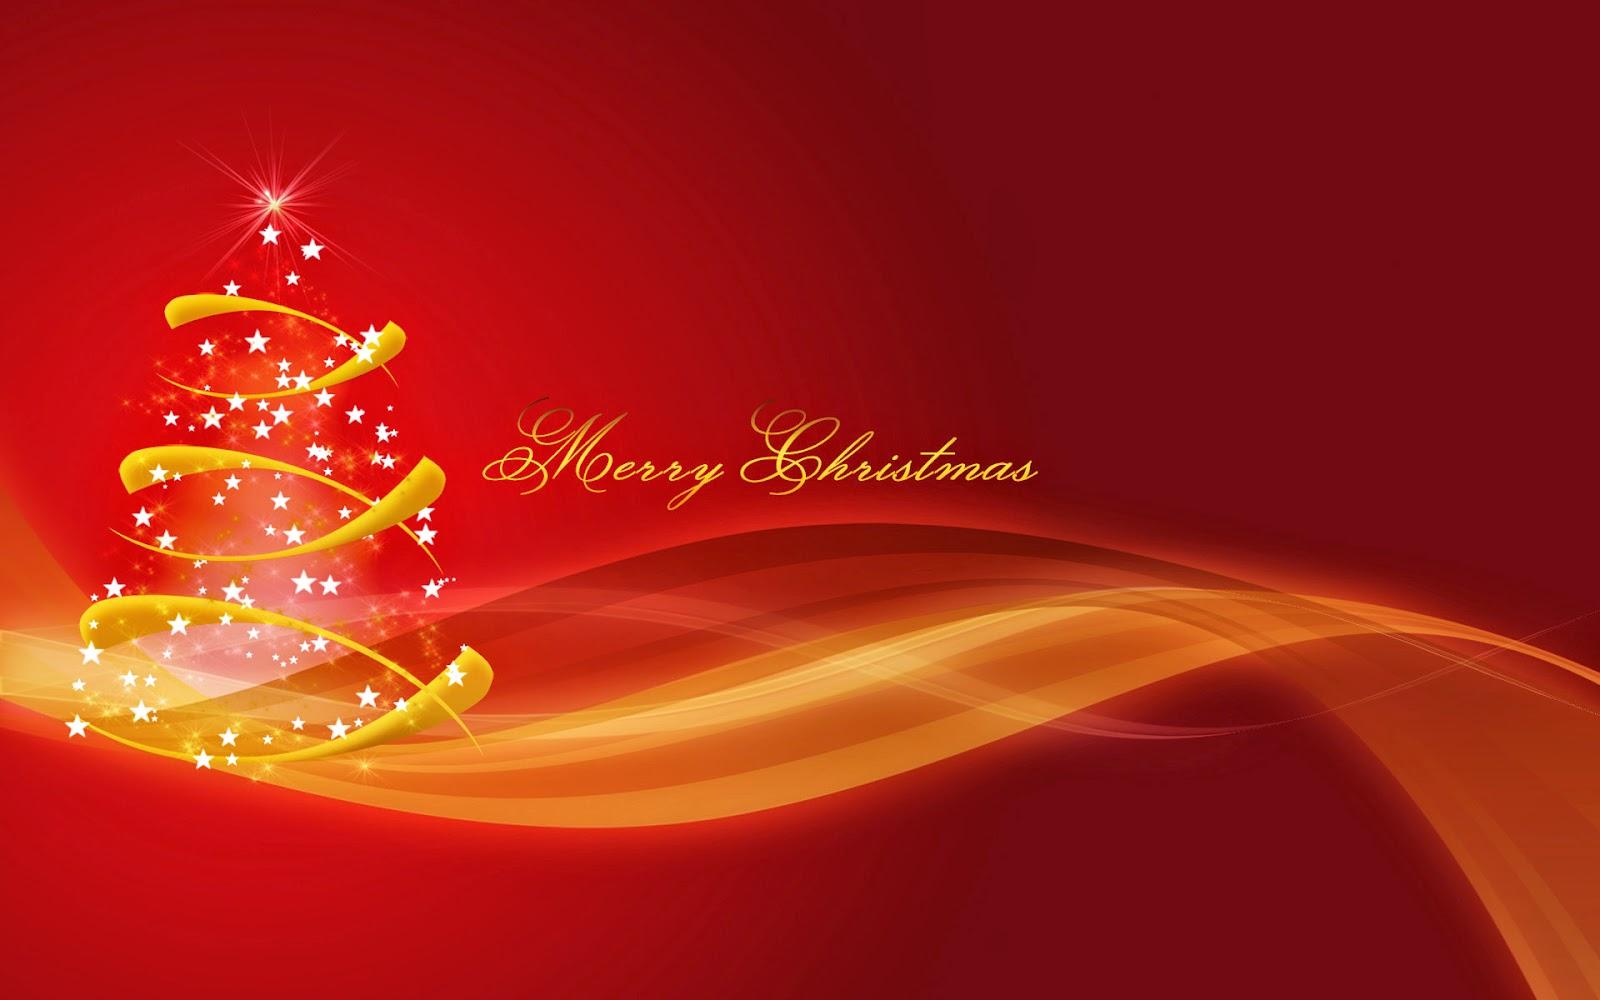 Merry Christmas Texted Xmas Tree